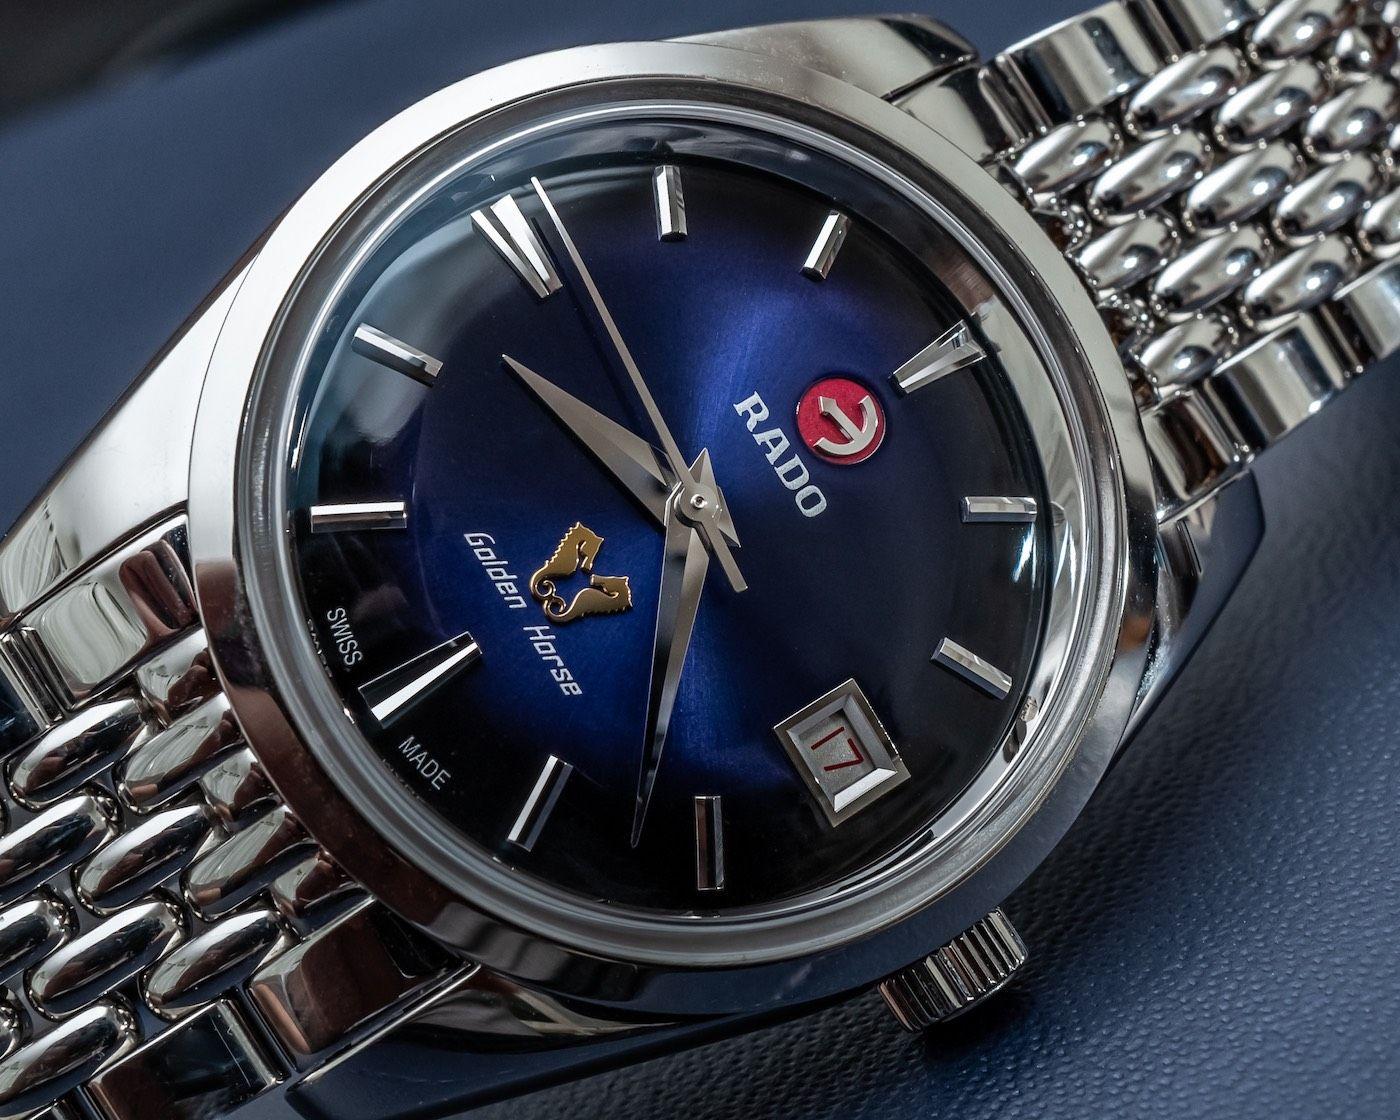 Hands On Rado Golden Horse 1957 Limited Edition Watch Ablogtowatch In 2020 Golden Horse Limited Edition Watches Rado